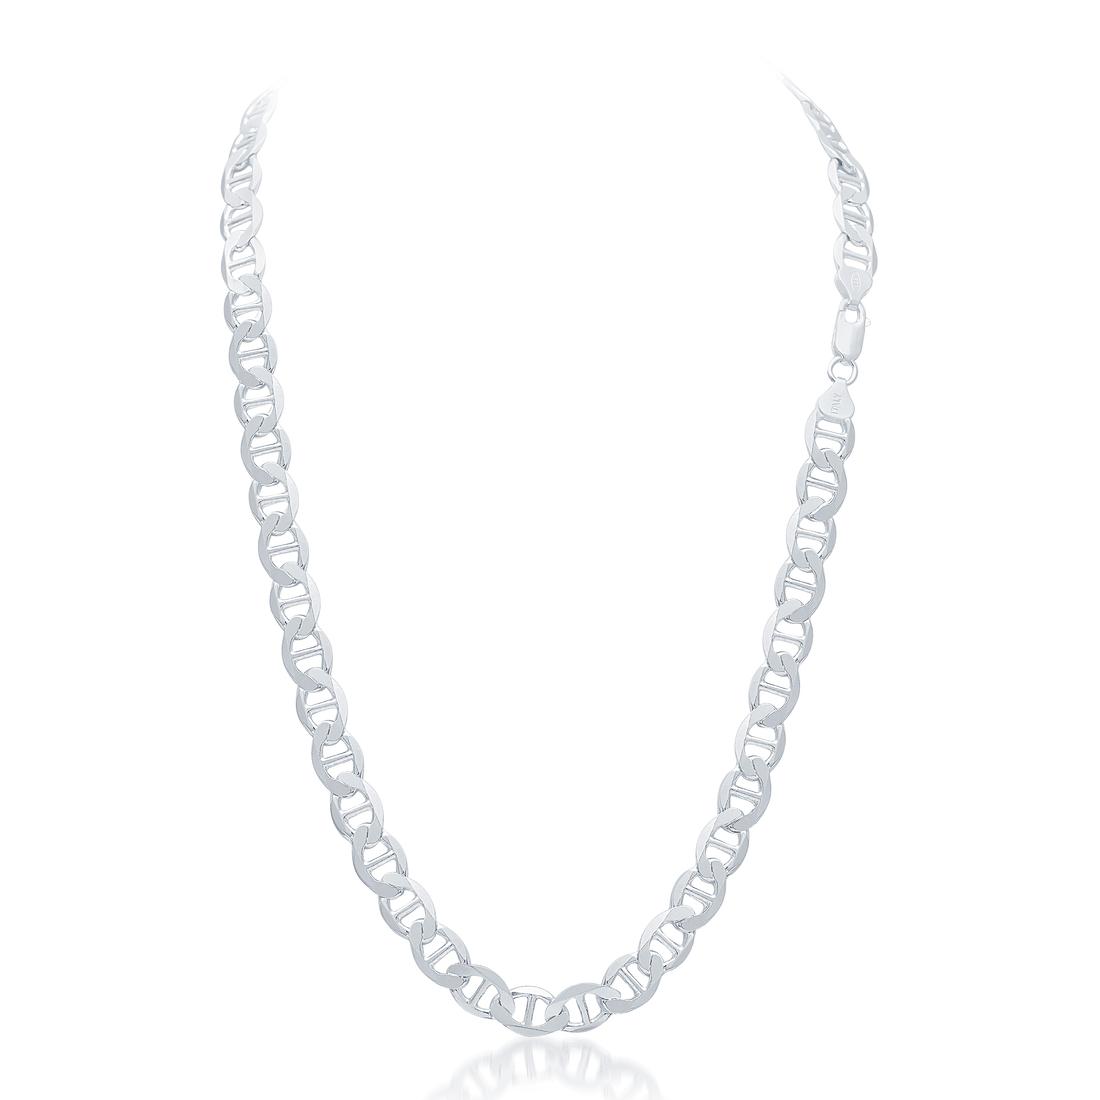 Karatcraft Silver Anchor Chain